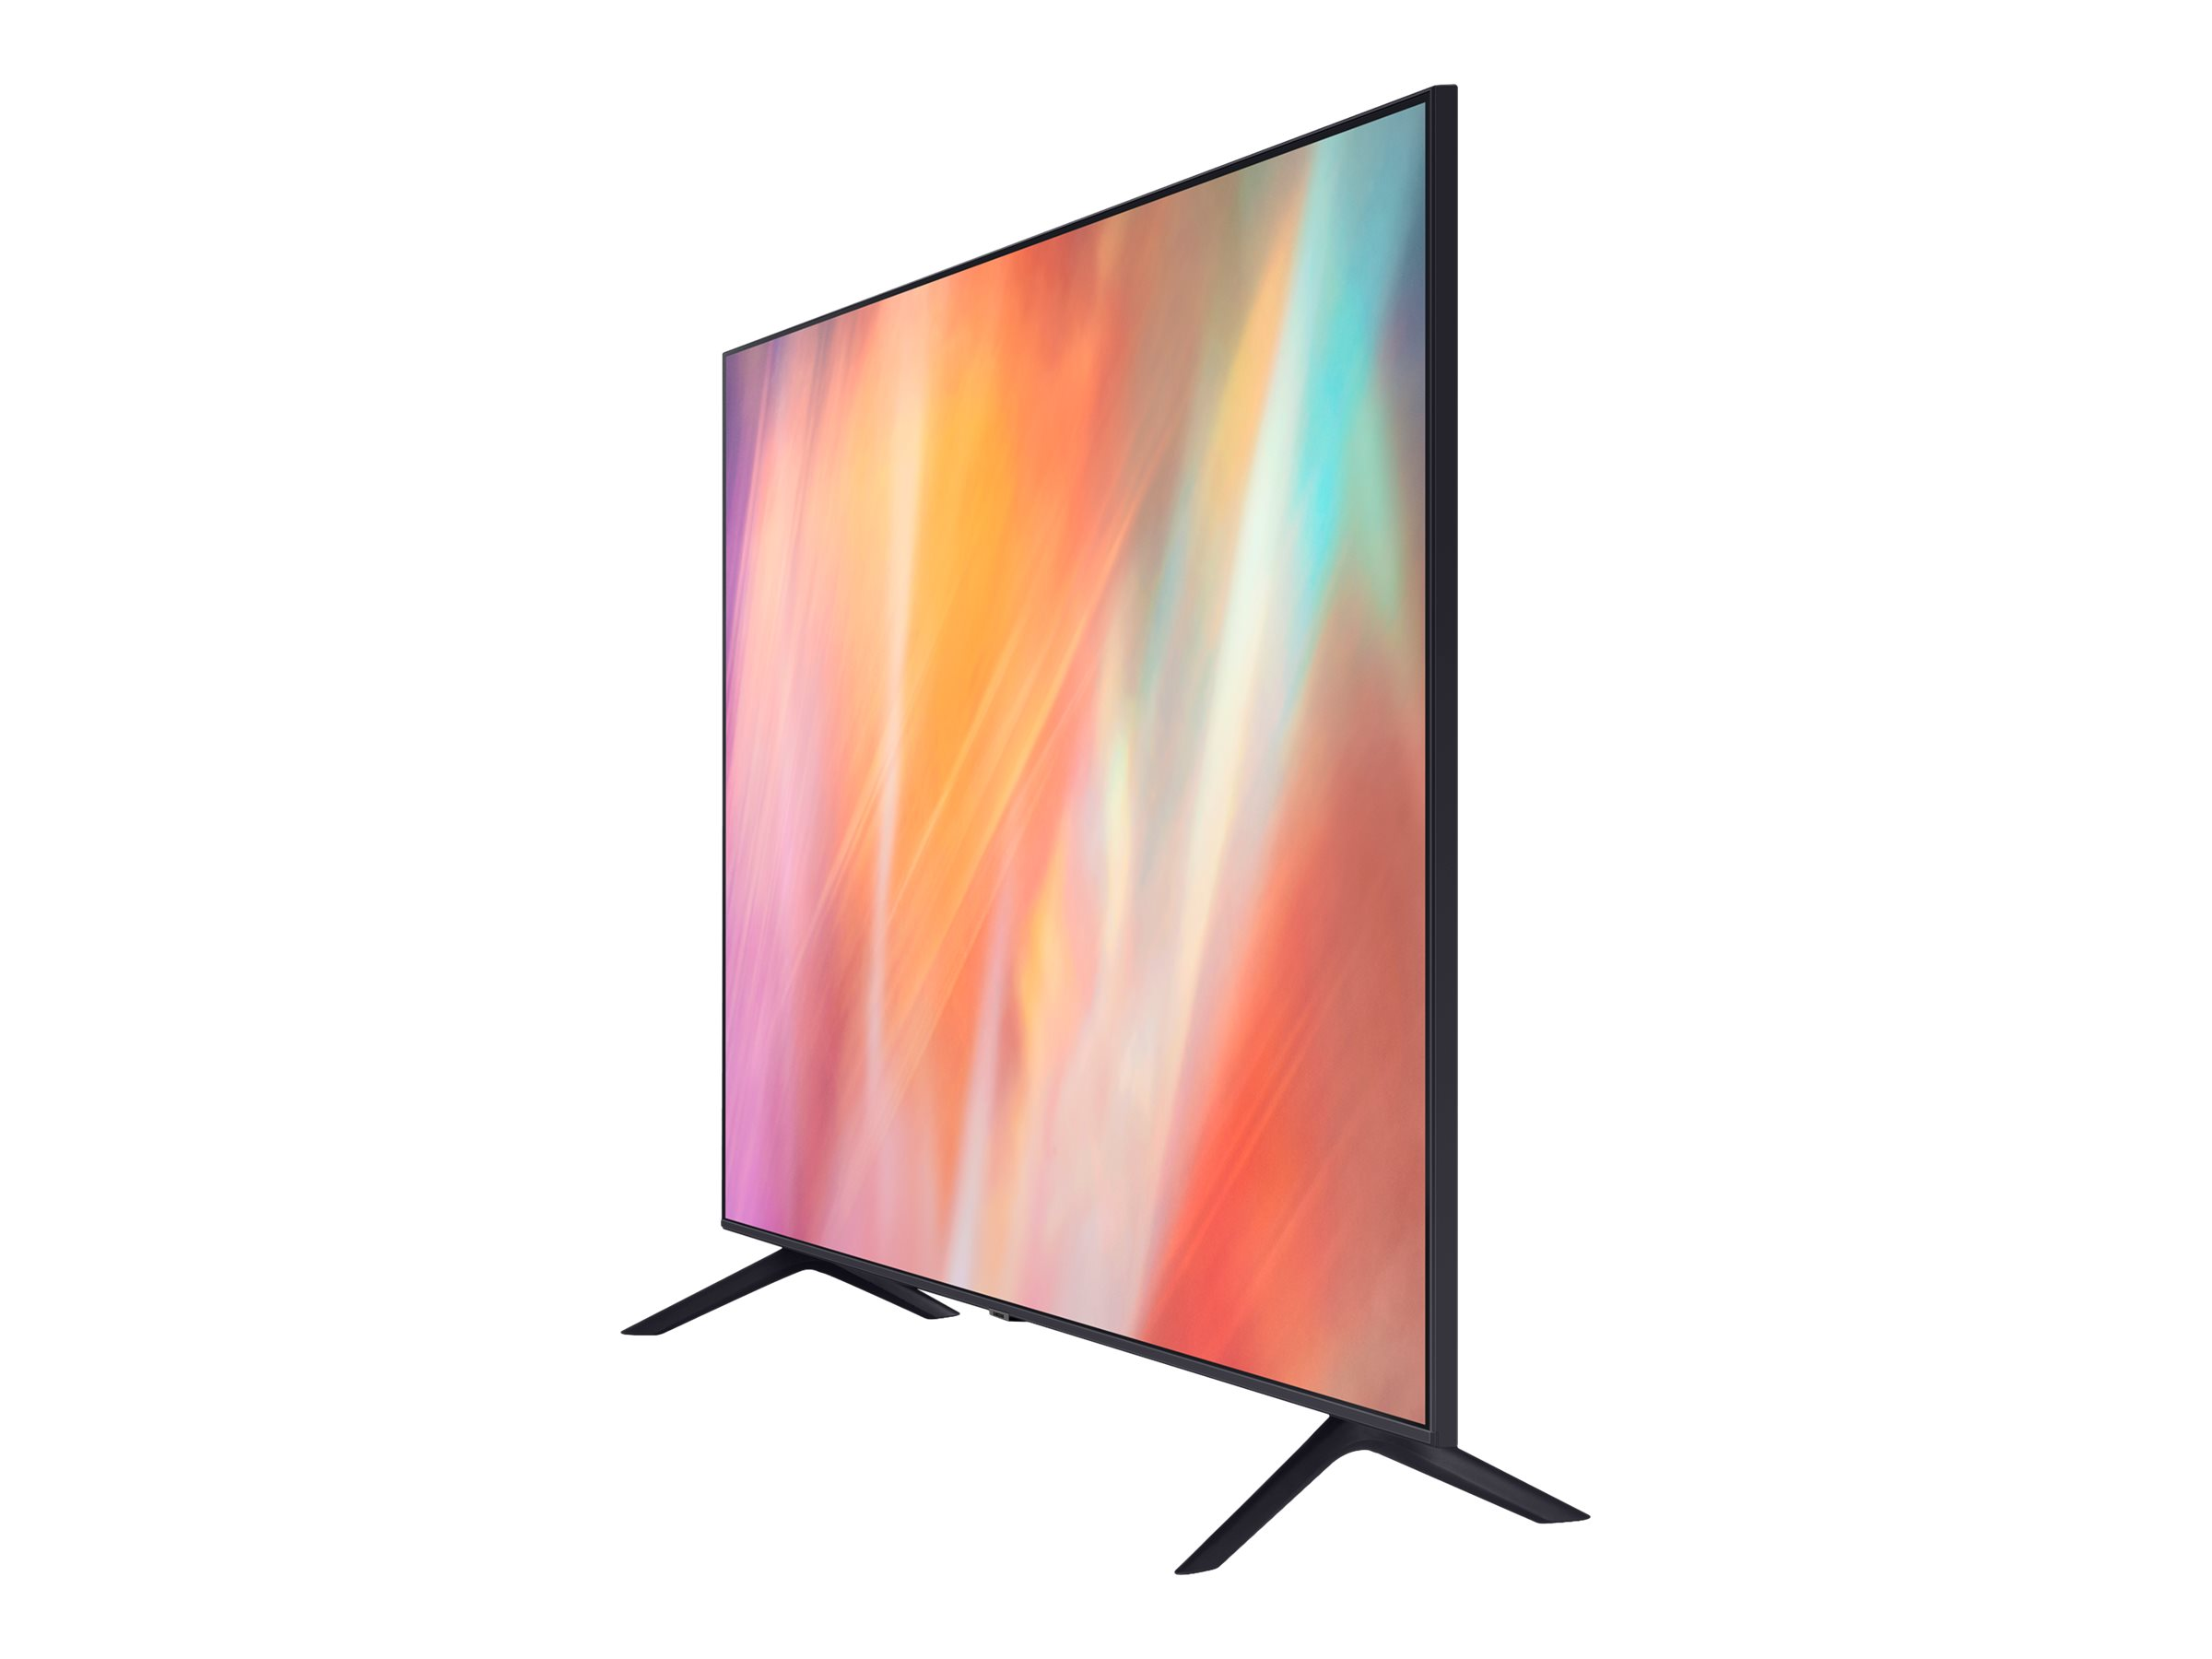 "Samsung BE65A-H - 163.9 cm (65"") Diagonalklasse BEA-H Series LCD-TV mit LED-Hintergrundbeleuchtung - Digital Signage - Smart TV - Tizen OS - 4K UHD (2160p)"